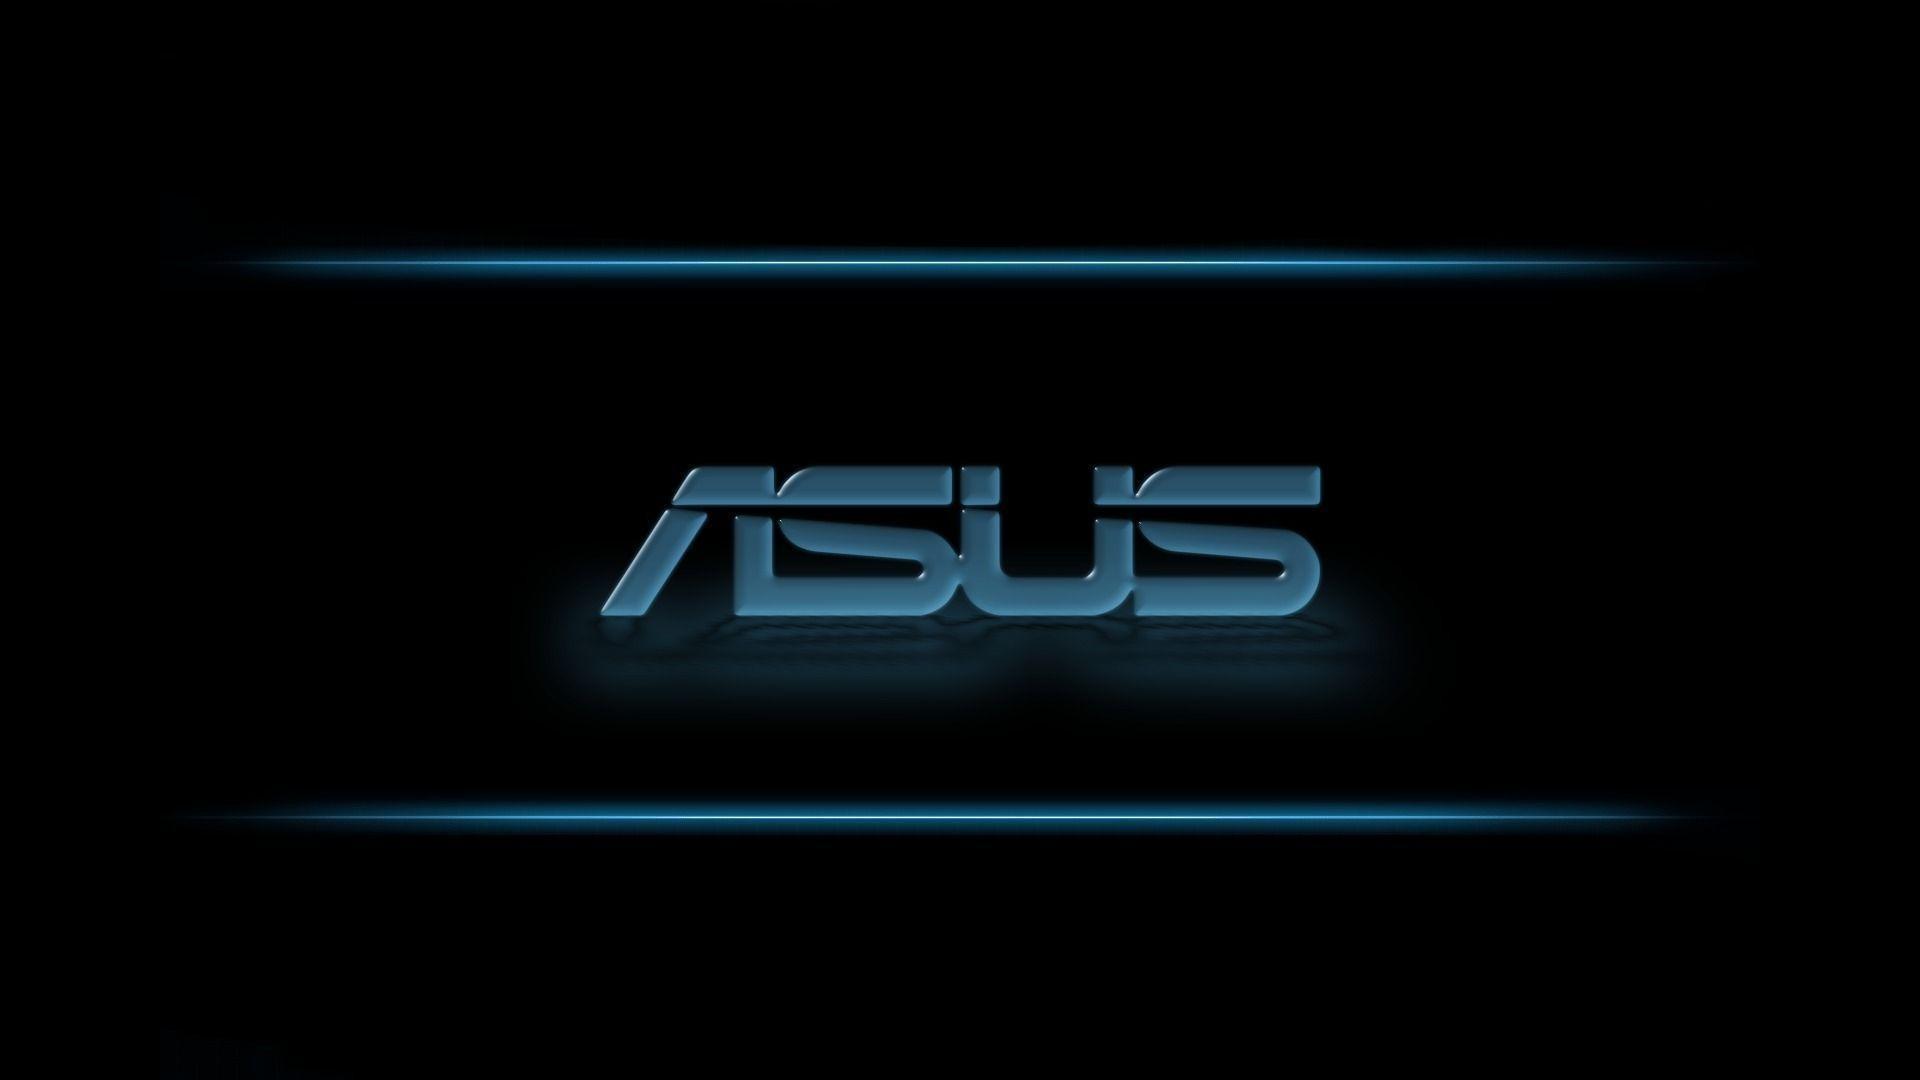 Asus Reflx Pc Motherboard Computer hd wallpaper #